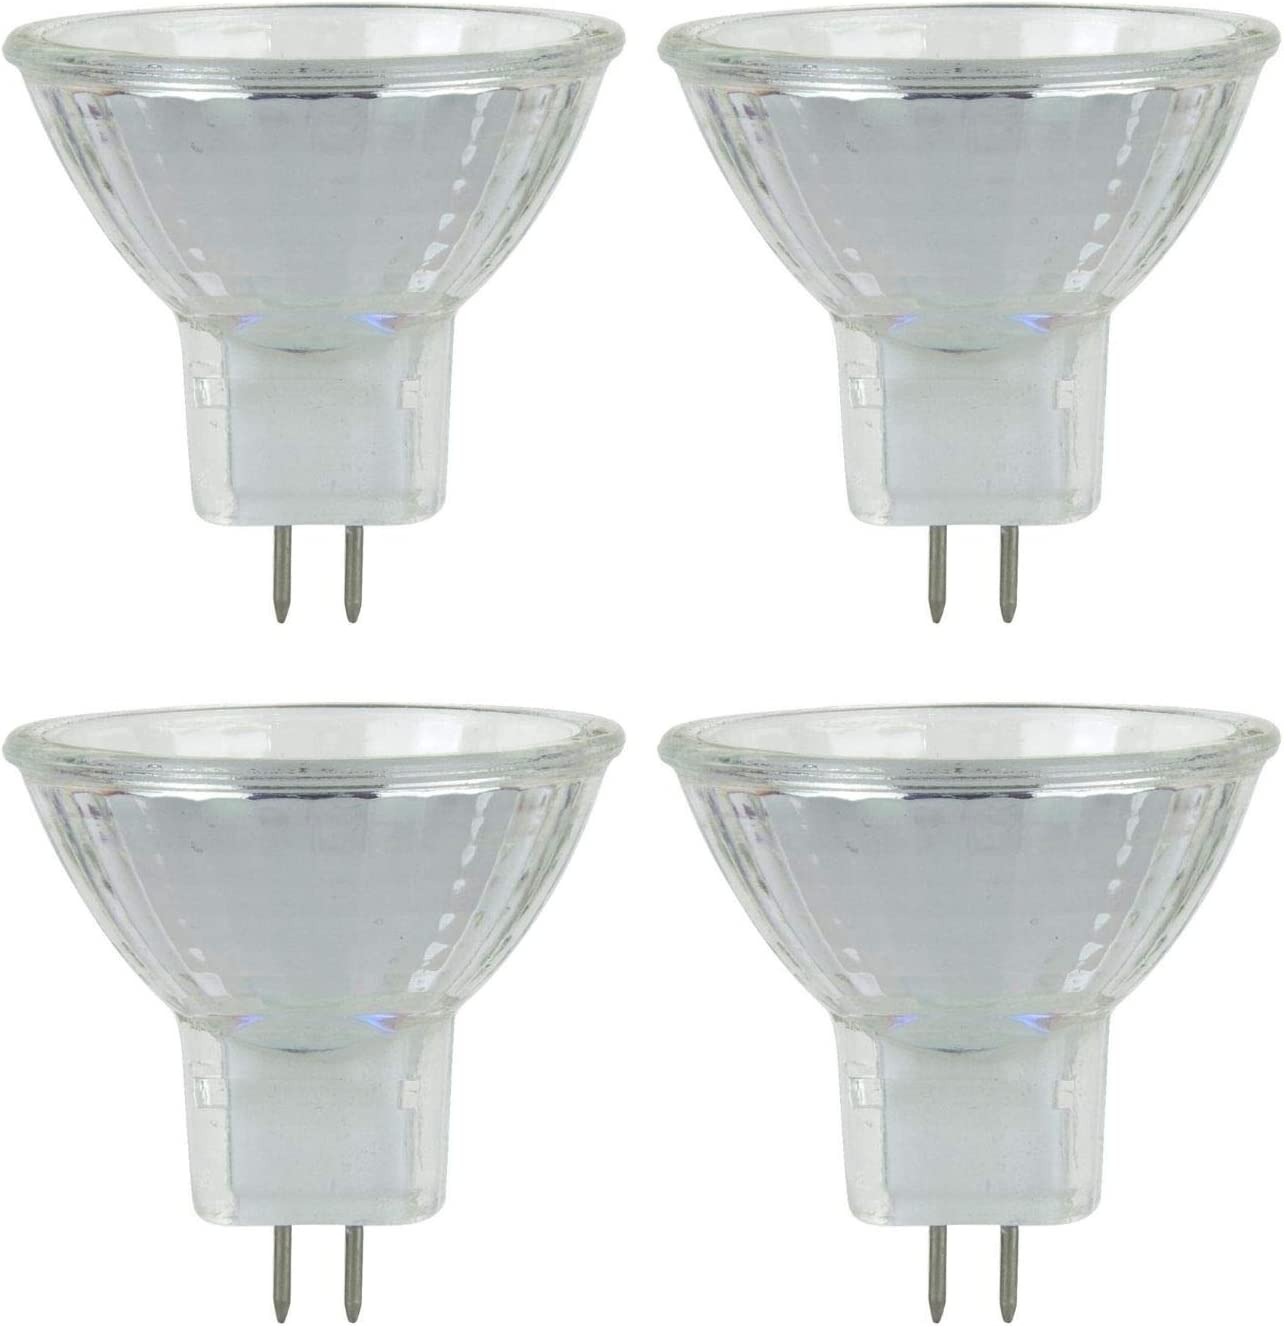 Sterl Lighting – 5 Watt MR11 Bi-Pin Flo GZ4 Base Hood Range Same Mail order cheap day shipping